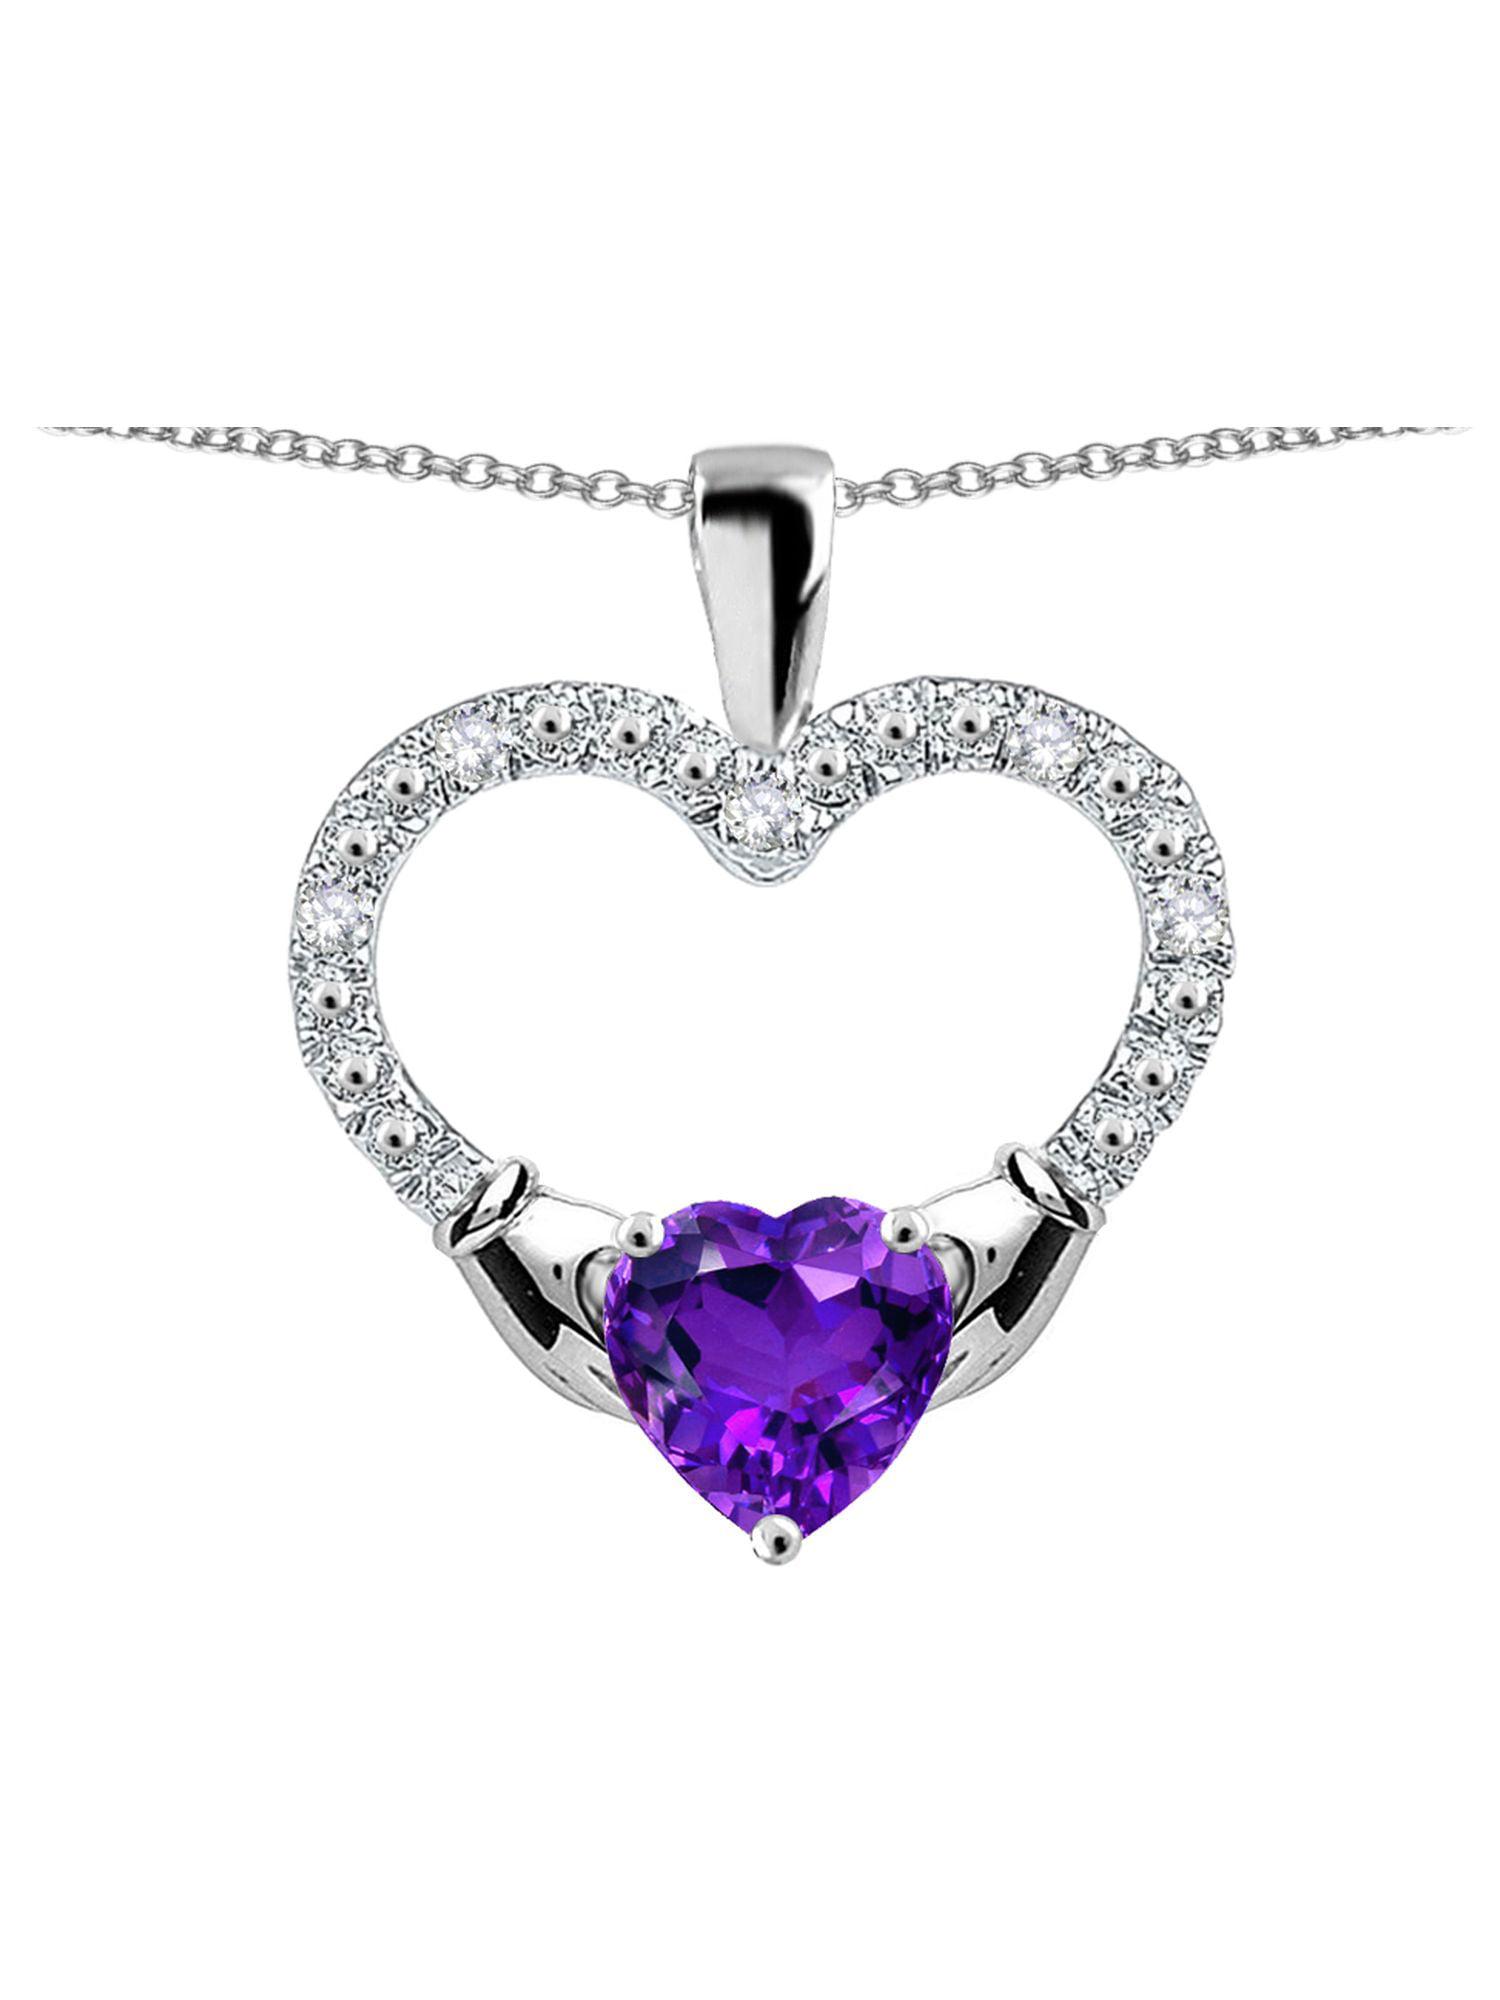 Star K Hands Holding Heart Genuine Amethyst Claddagh Pendant Necklace